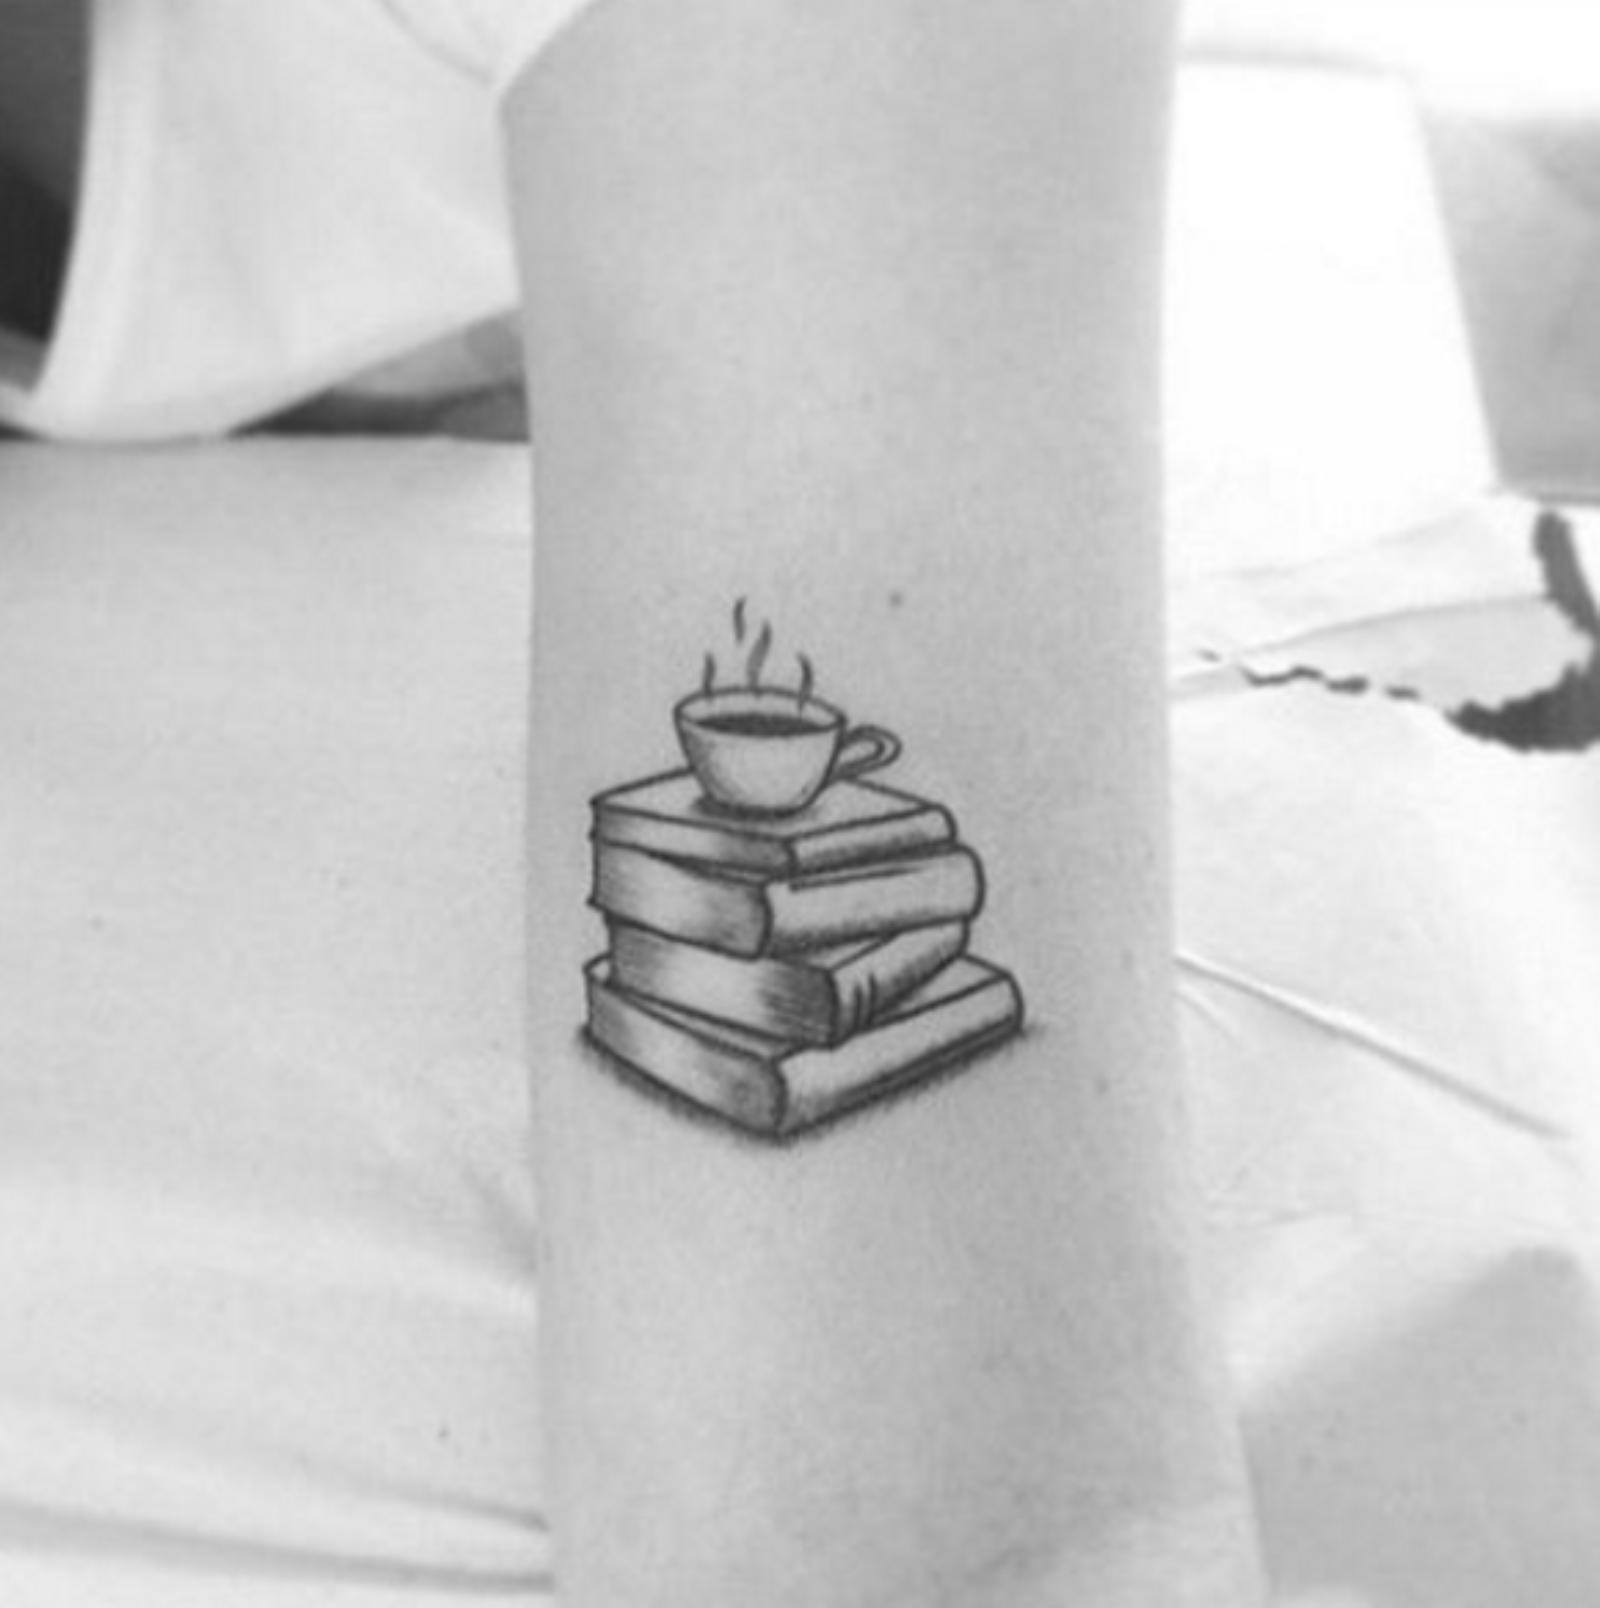 13 Tattoos Every Coffee Lover Needs